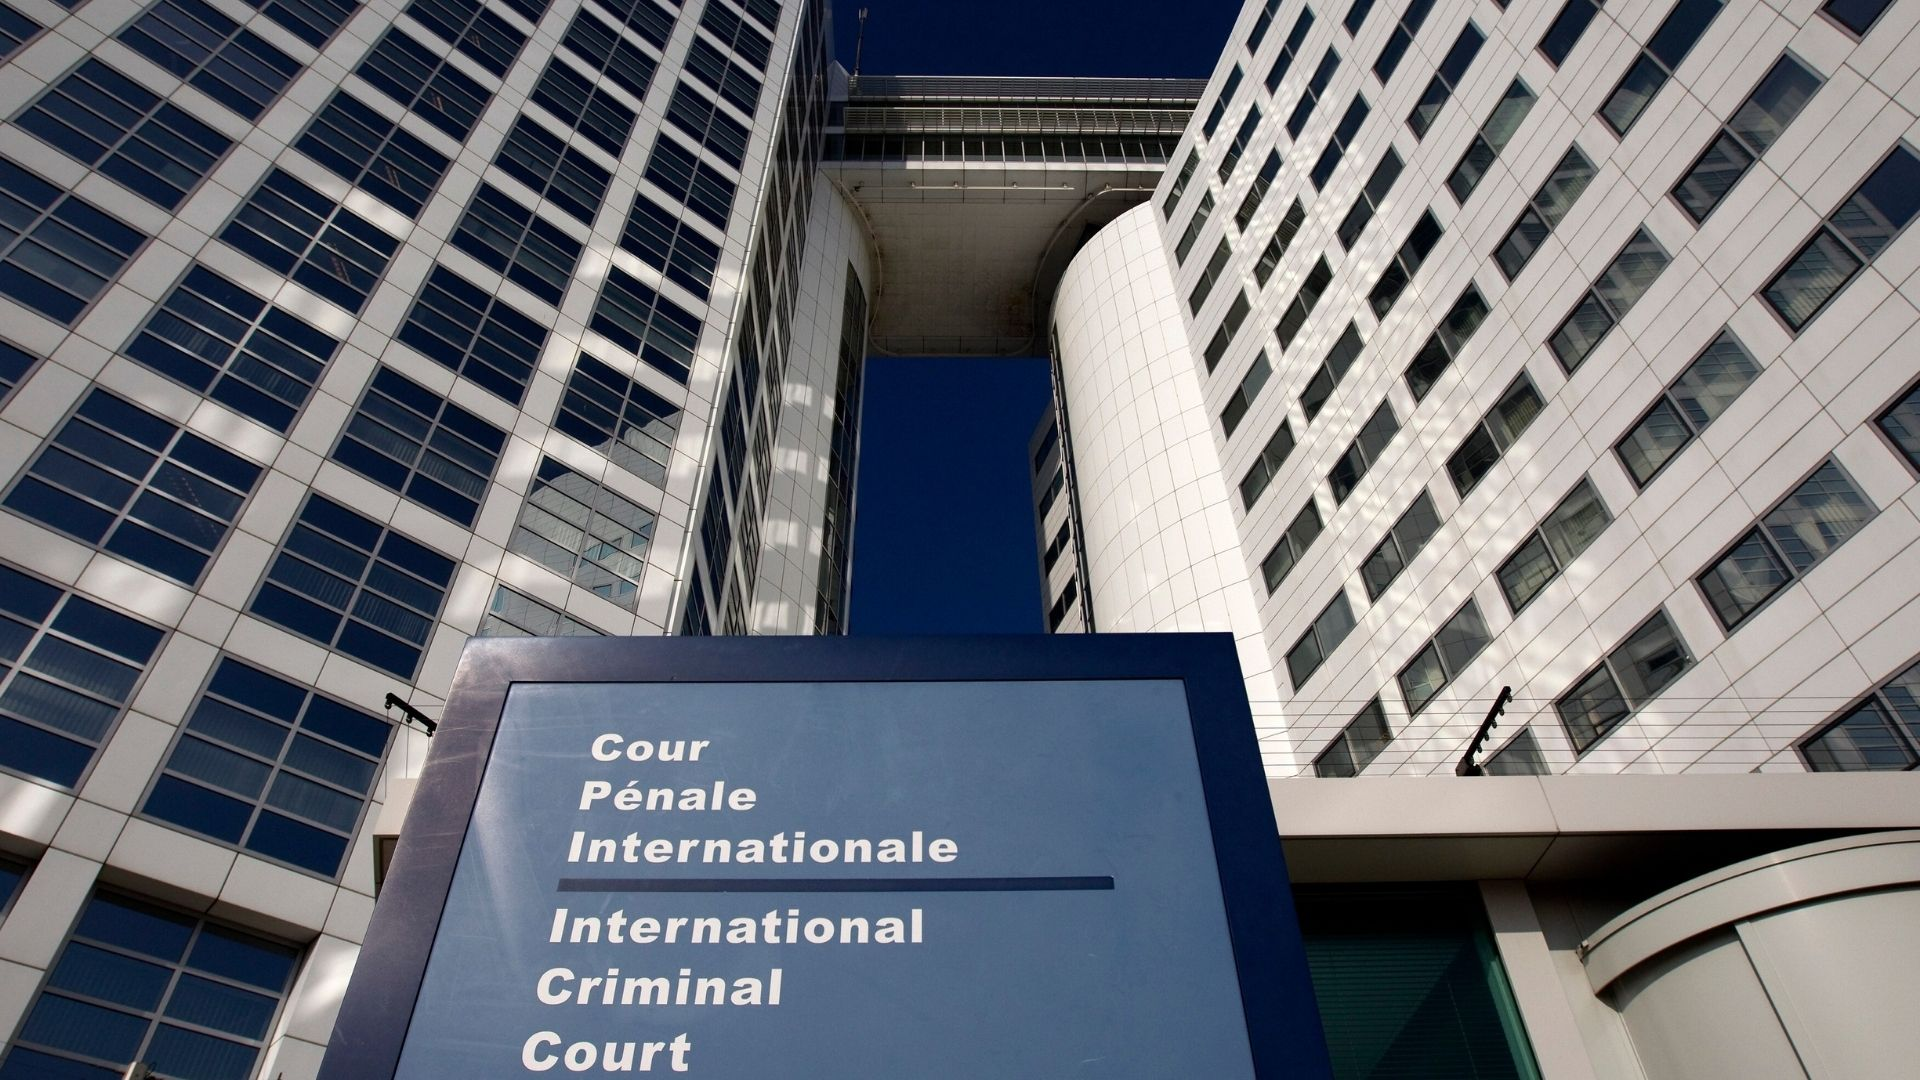 Solicitan que Corte Penal Internacional inicie investigacion sobre Venezuela